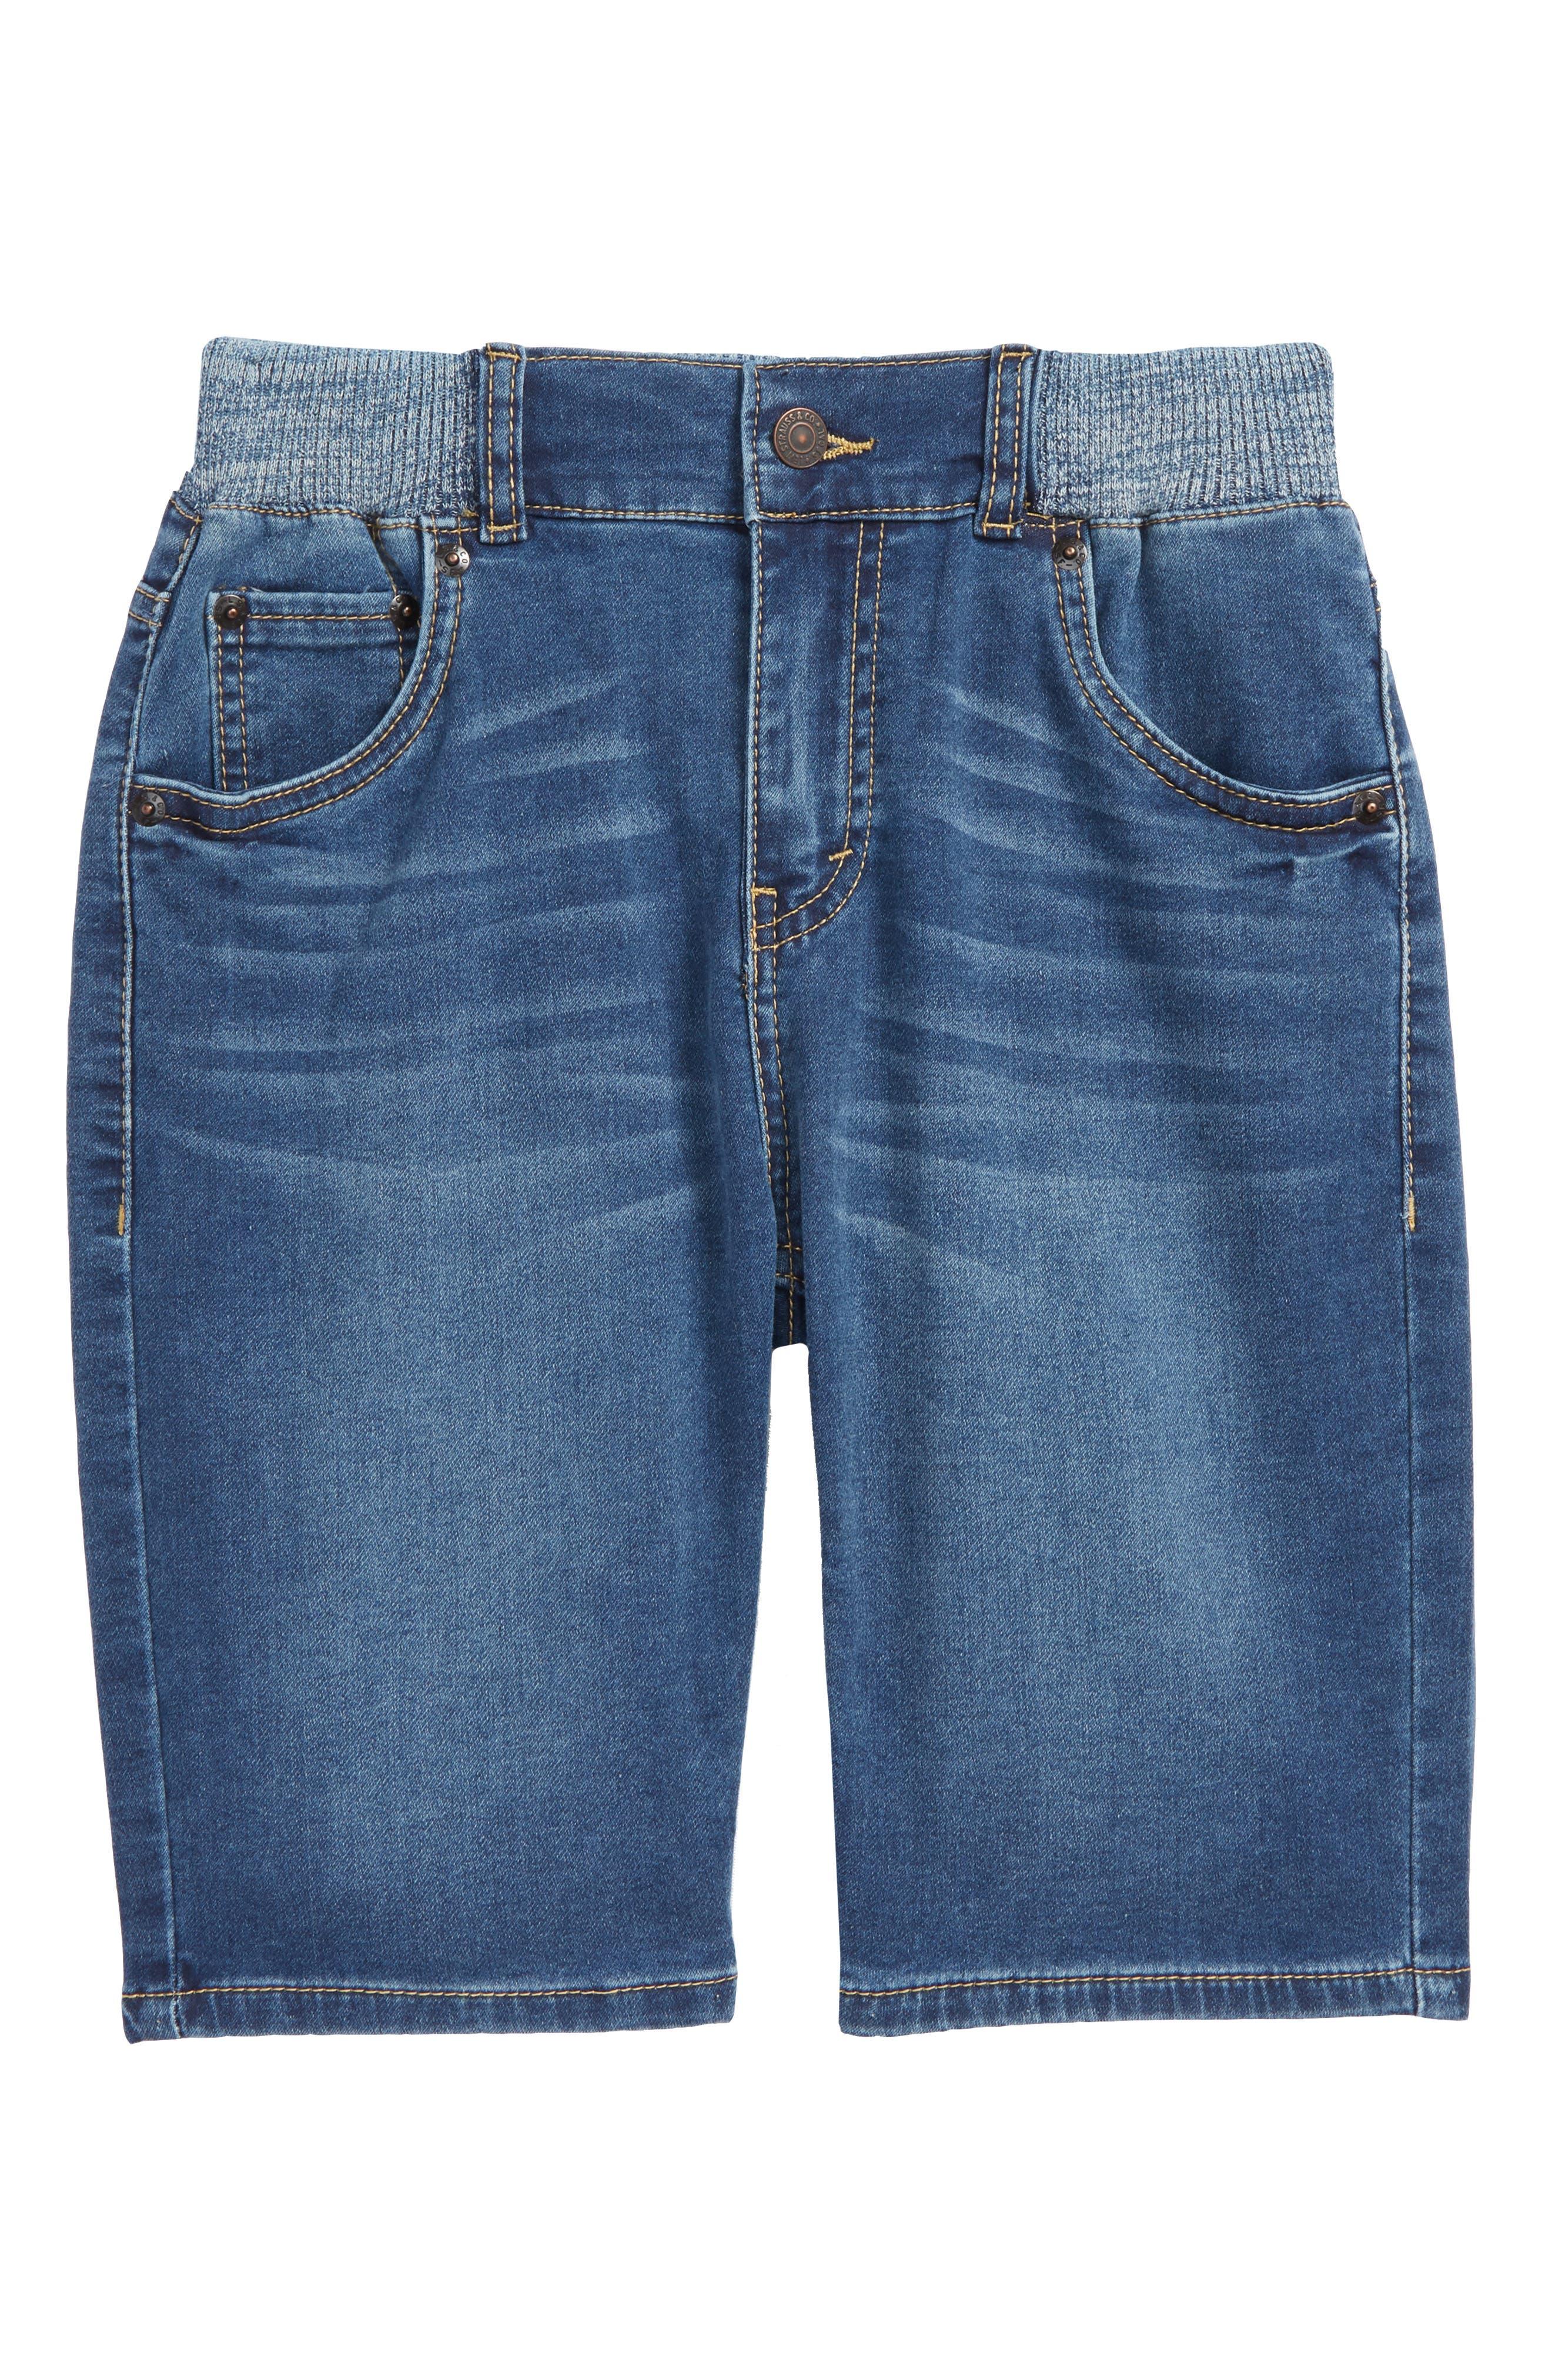 Levi's Super Chill Denim Shorts,                         Main,                         color, Coastal Sd